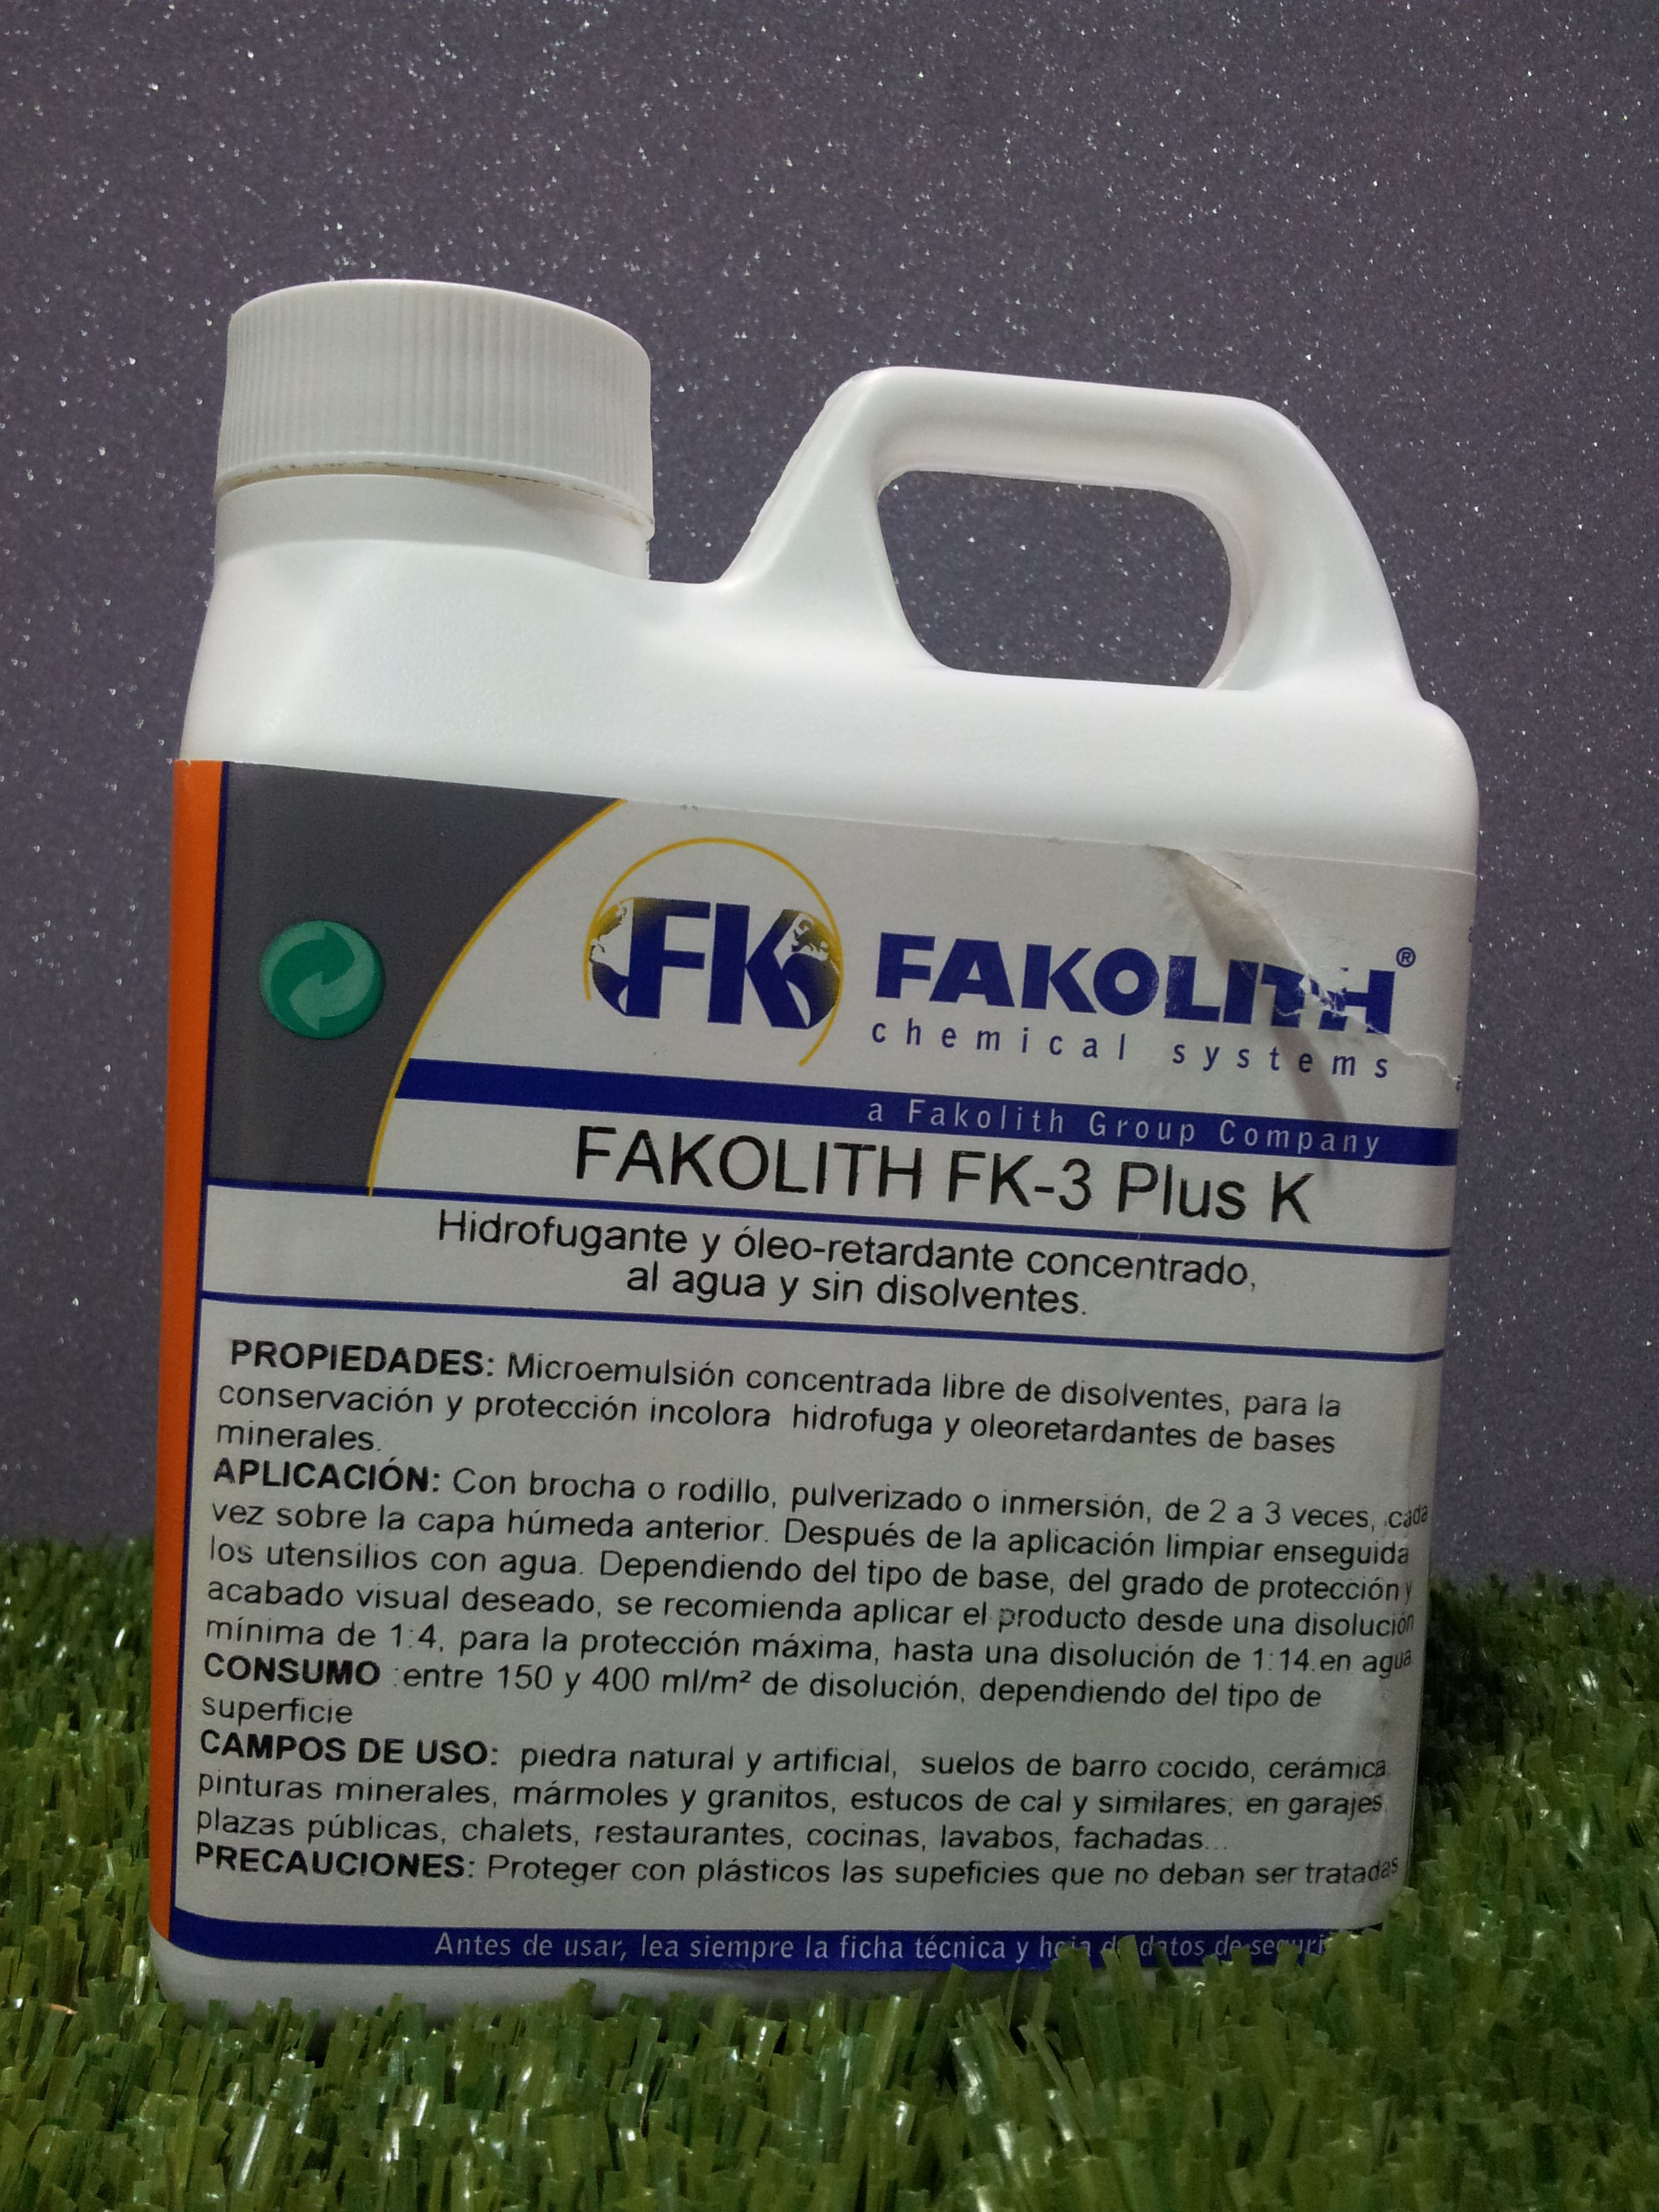 Fakolith FK-3 Plus K